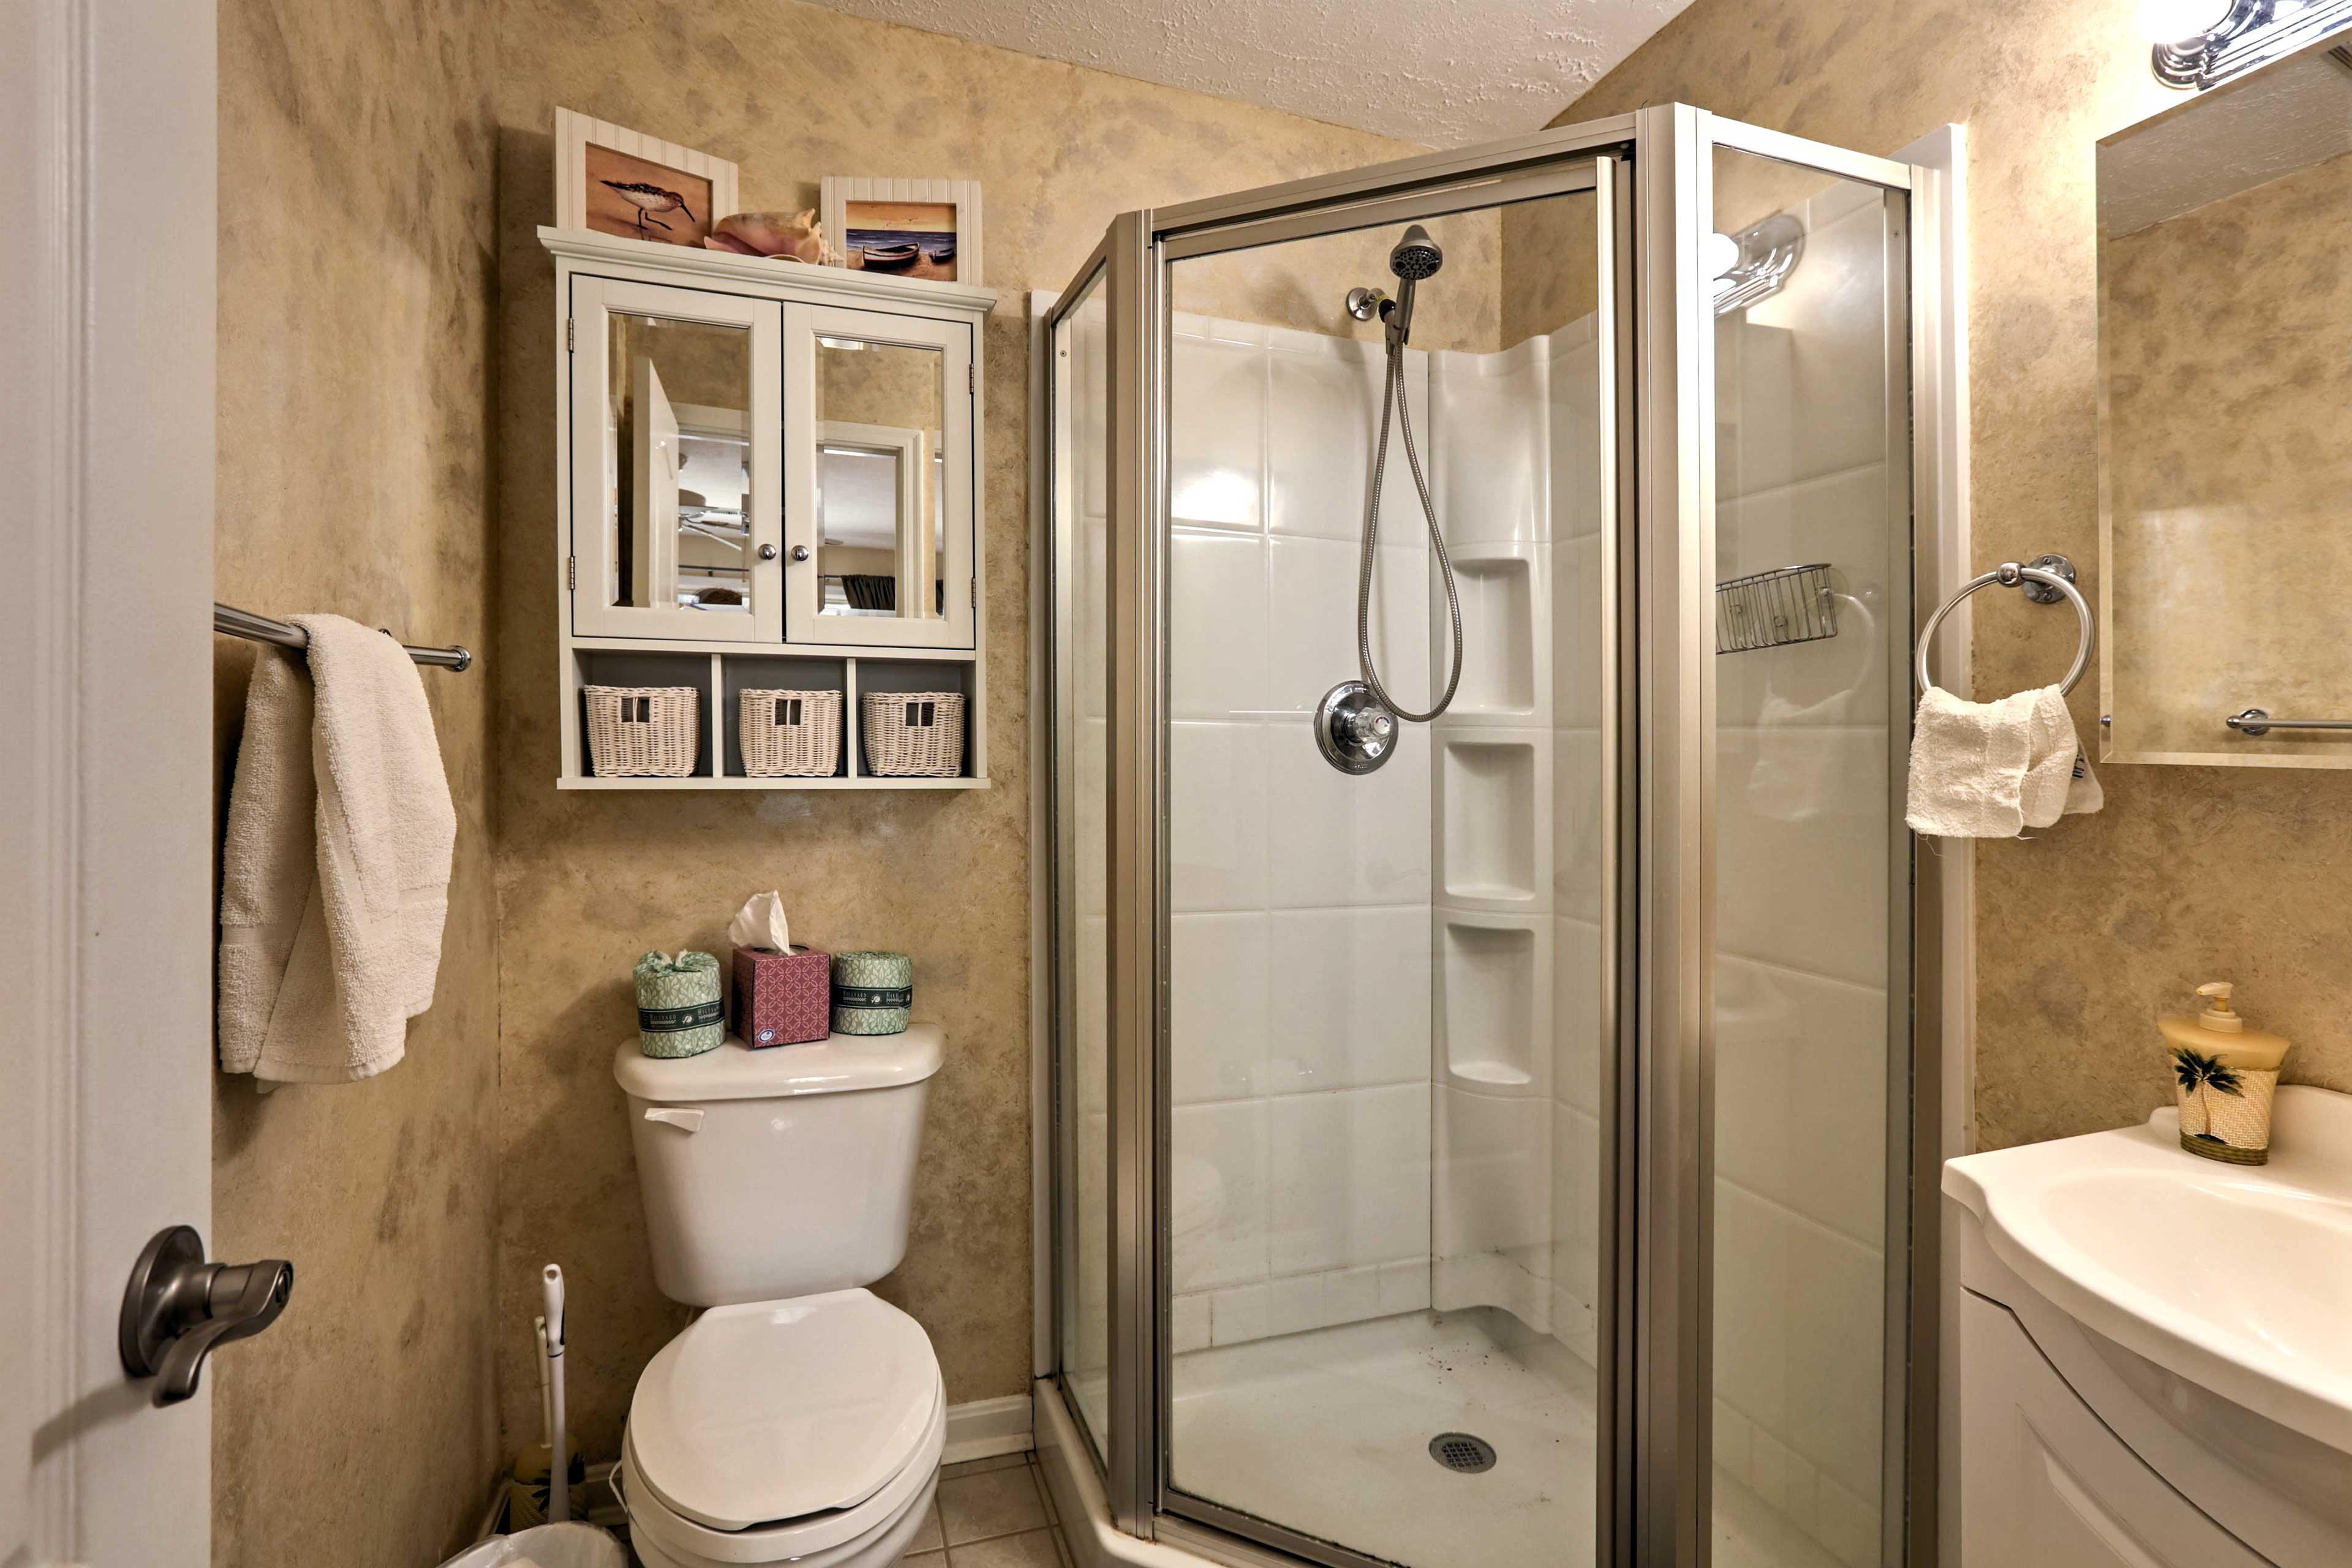 An en-suite bathroom with walk-in shower accompanies the master bedroom.